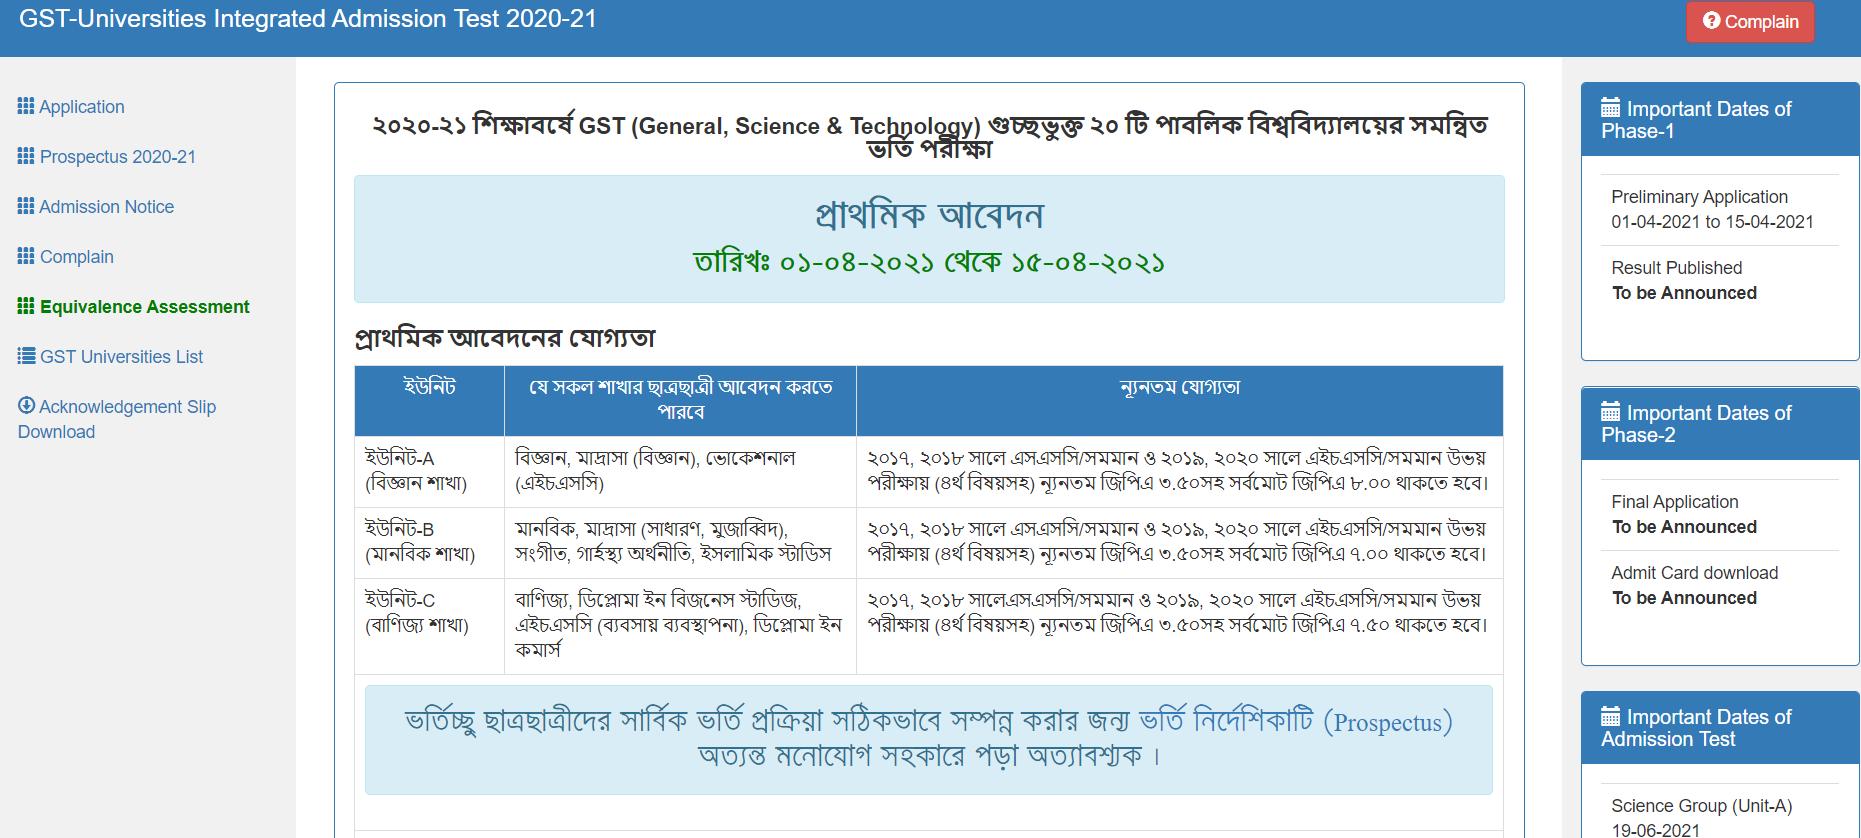 GST Admission 2020-21